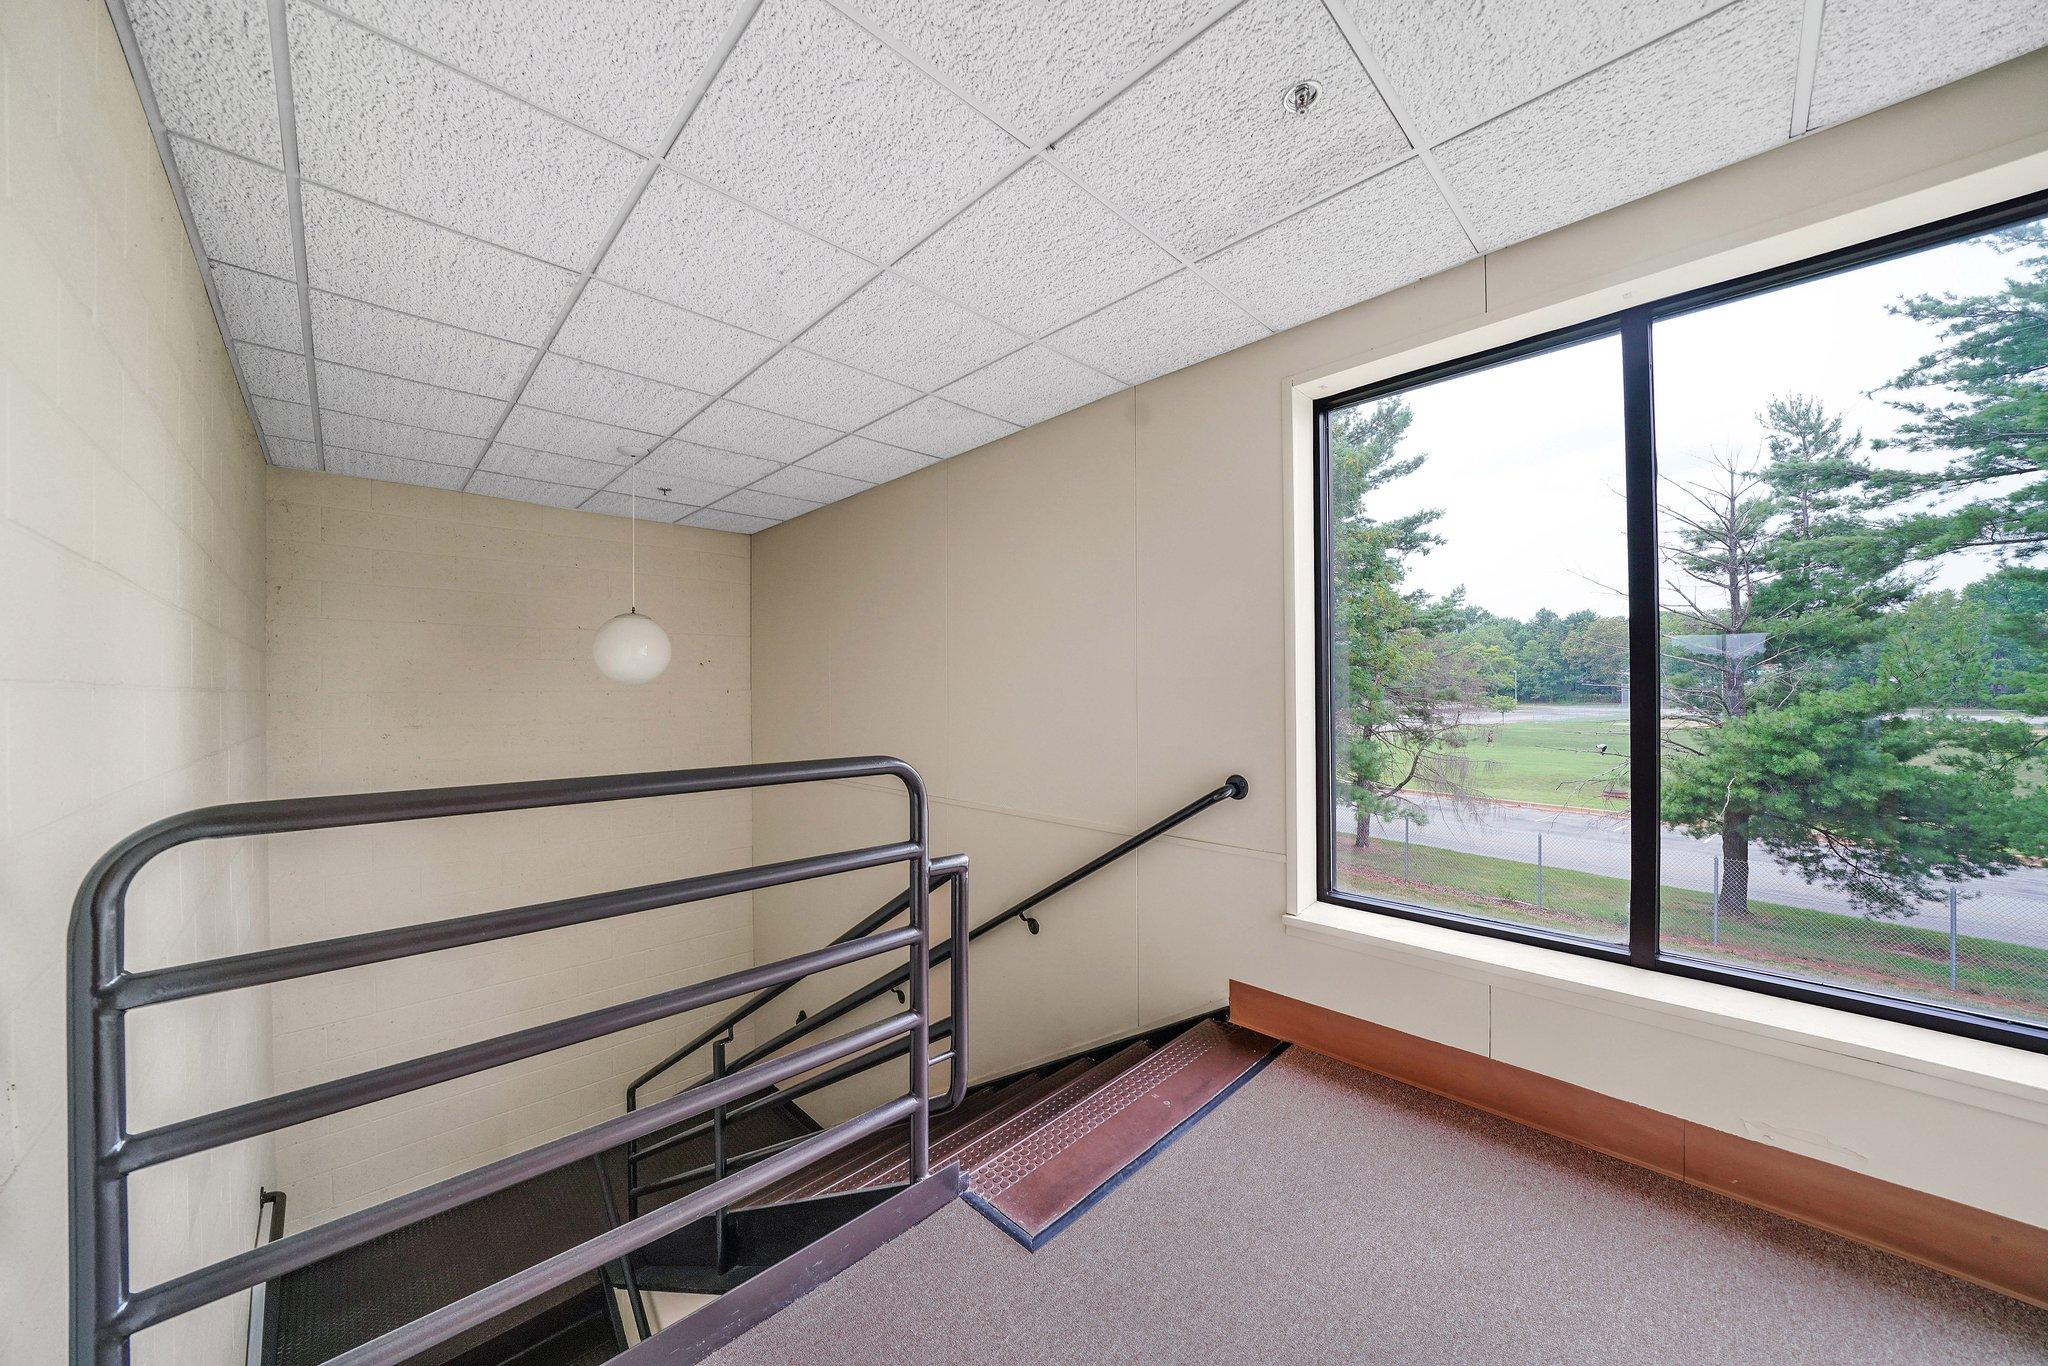 Rear stairwell